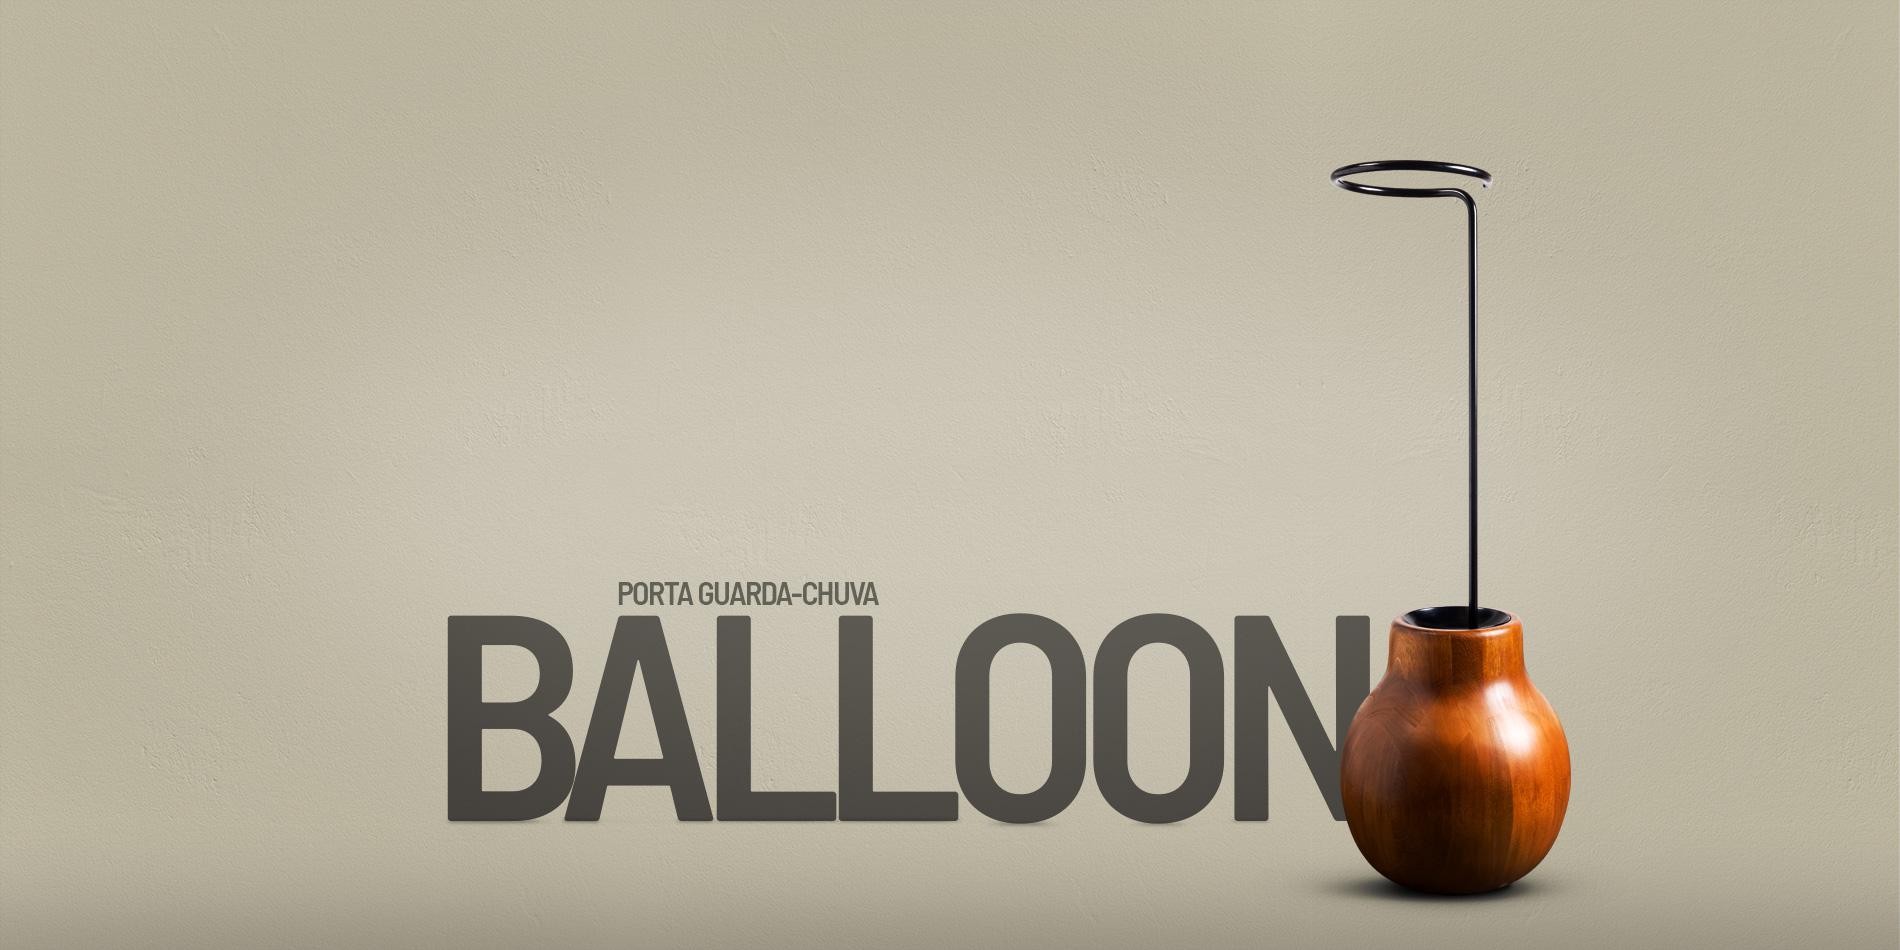 guarda-chuva balloon